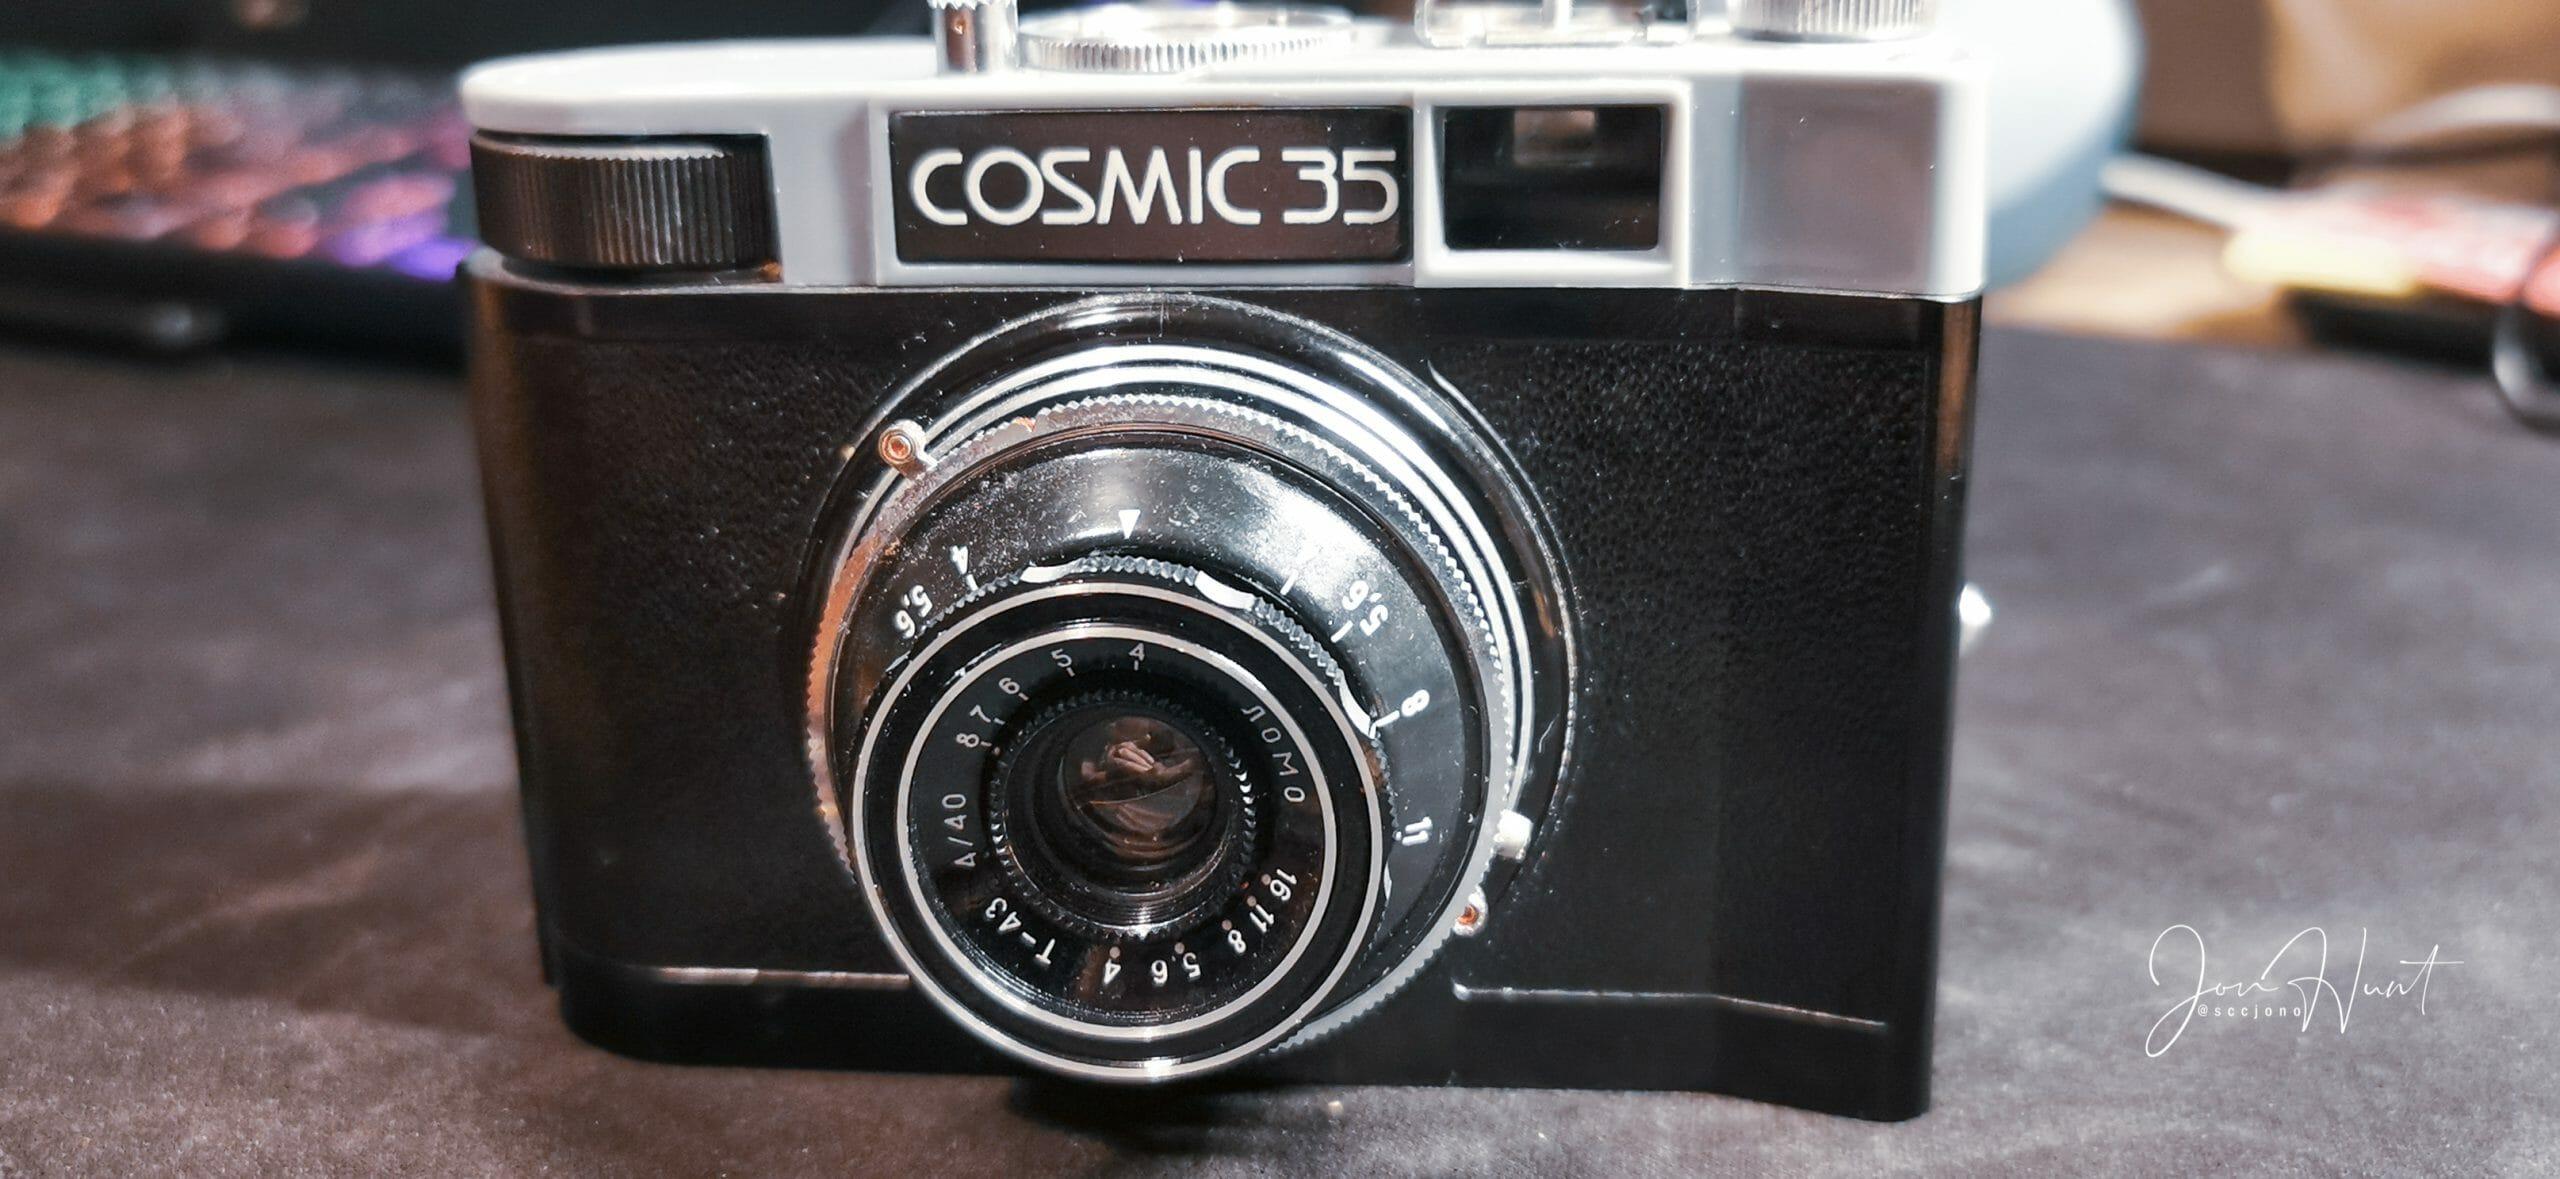 Cosmic Camera